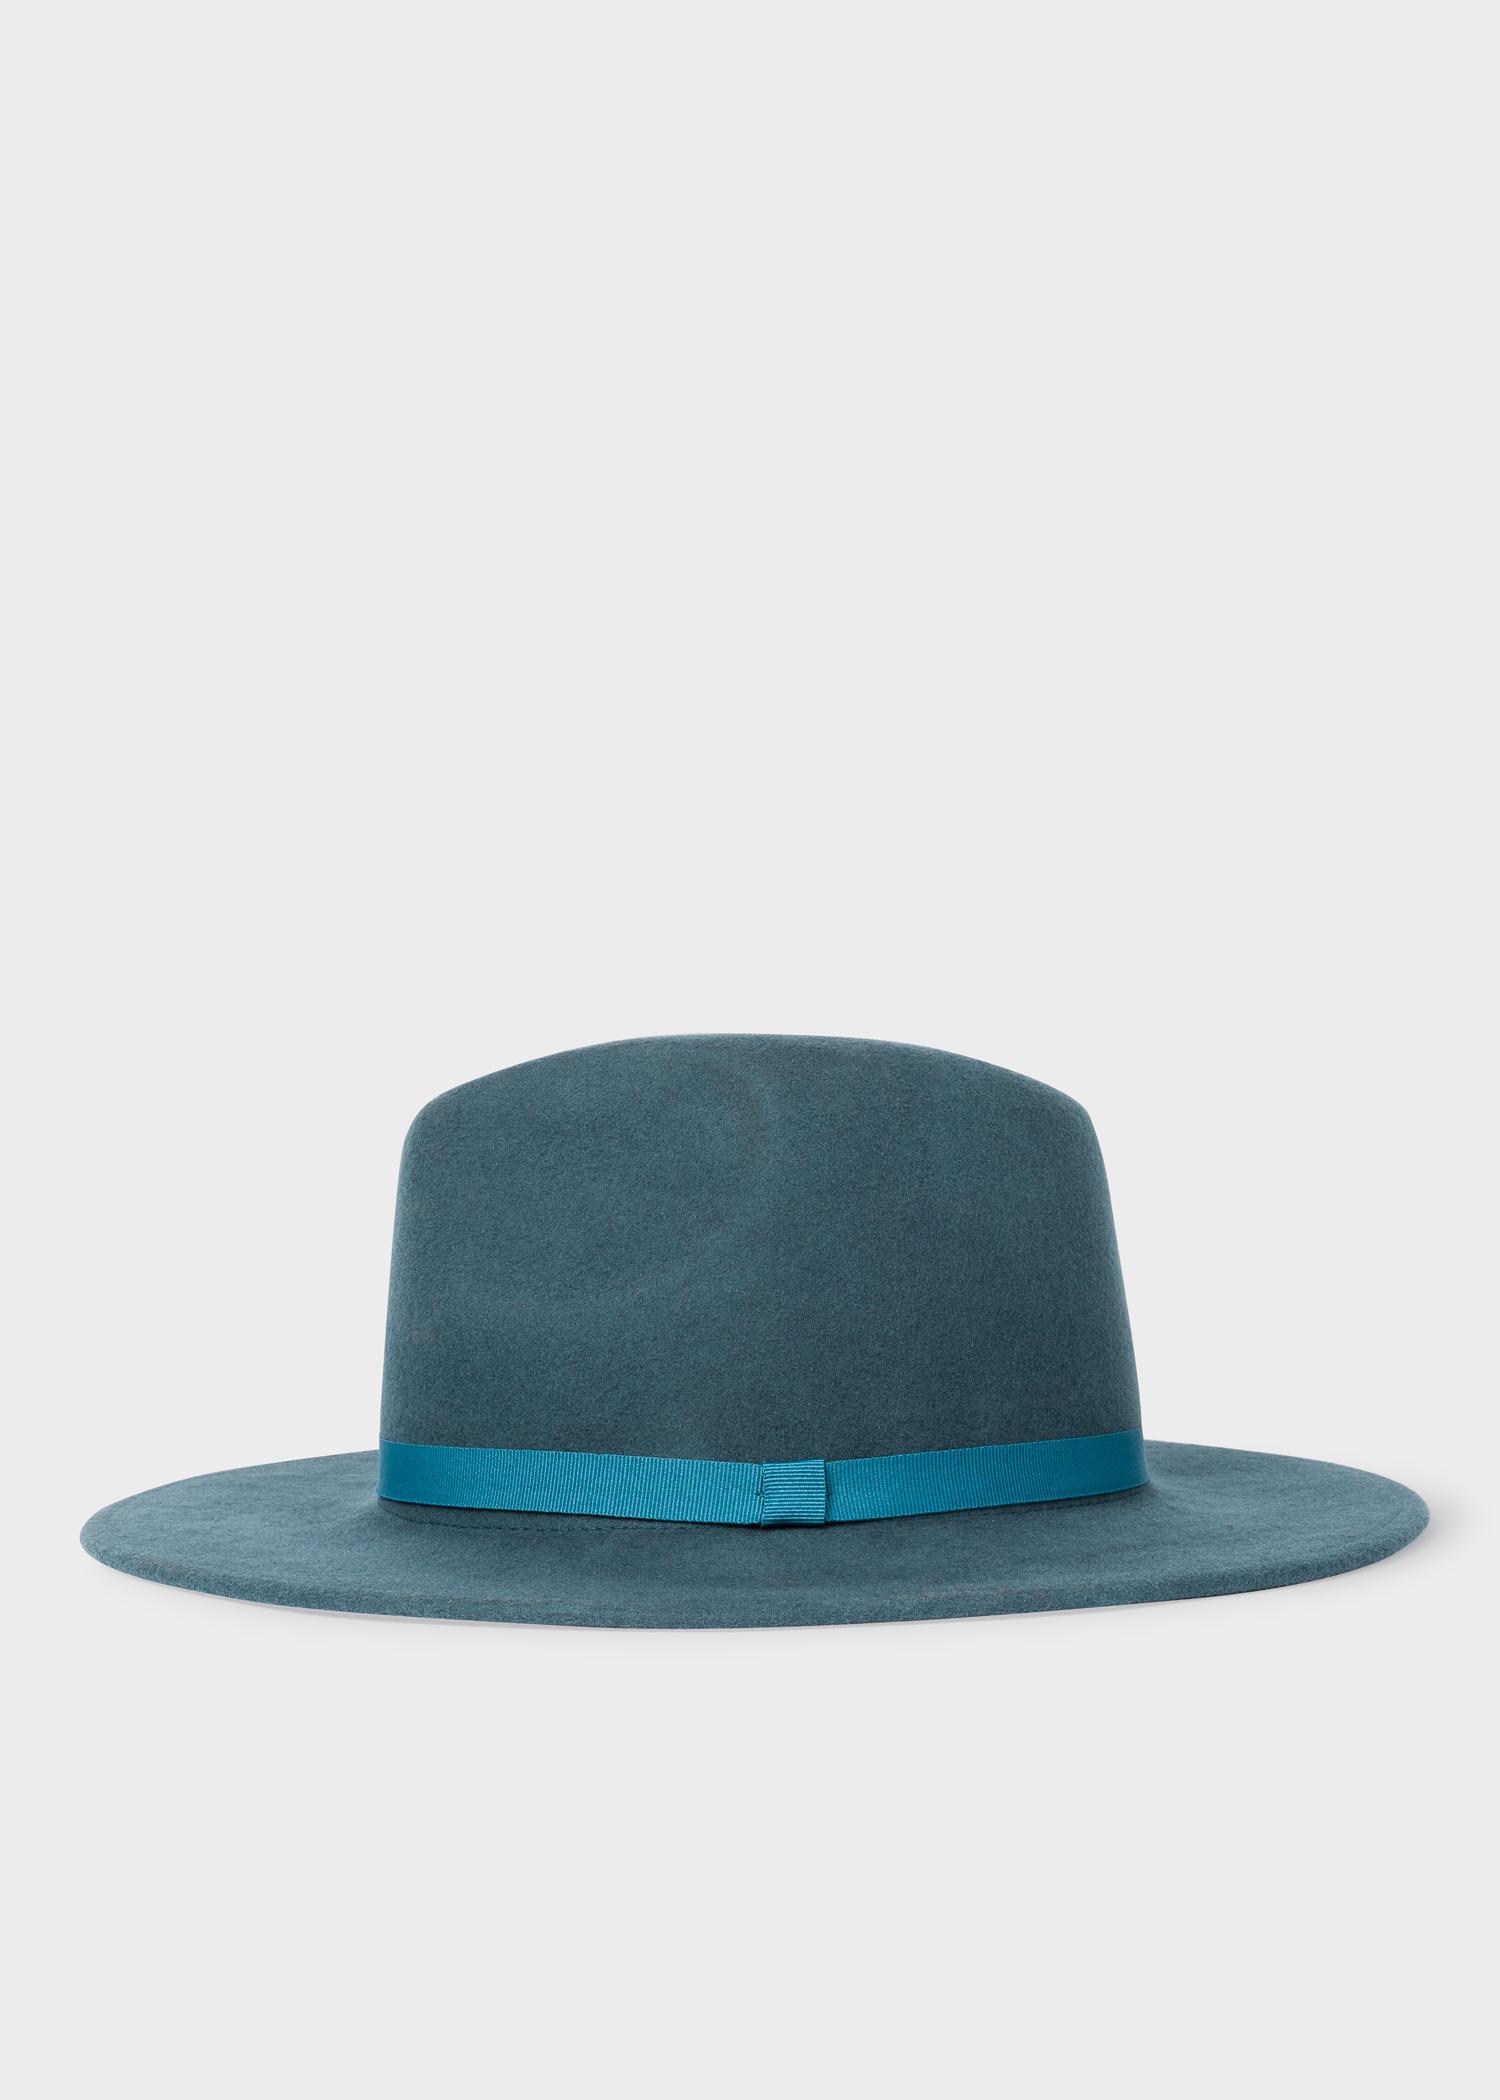 Women s Slate Blue Wool Fedora Hat With  Acapulco  Lining - Paul ... 4e23fa4a8